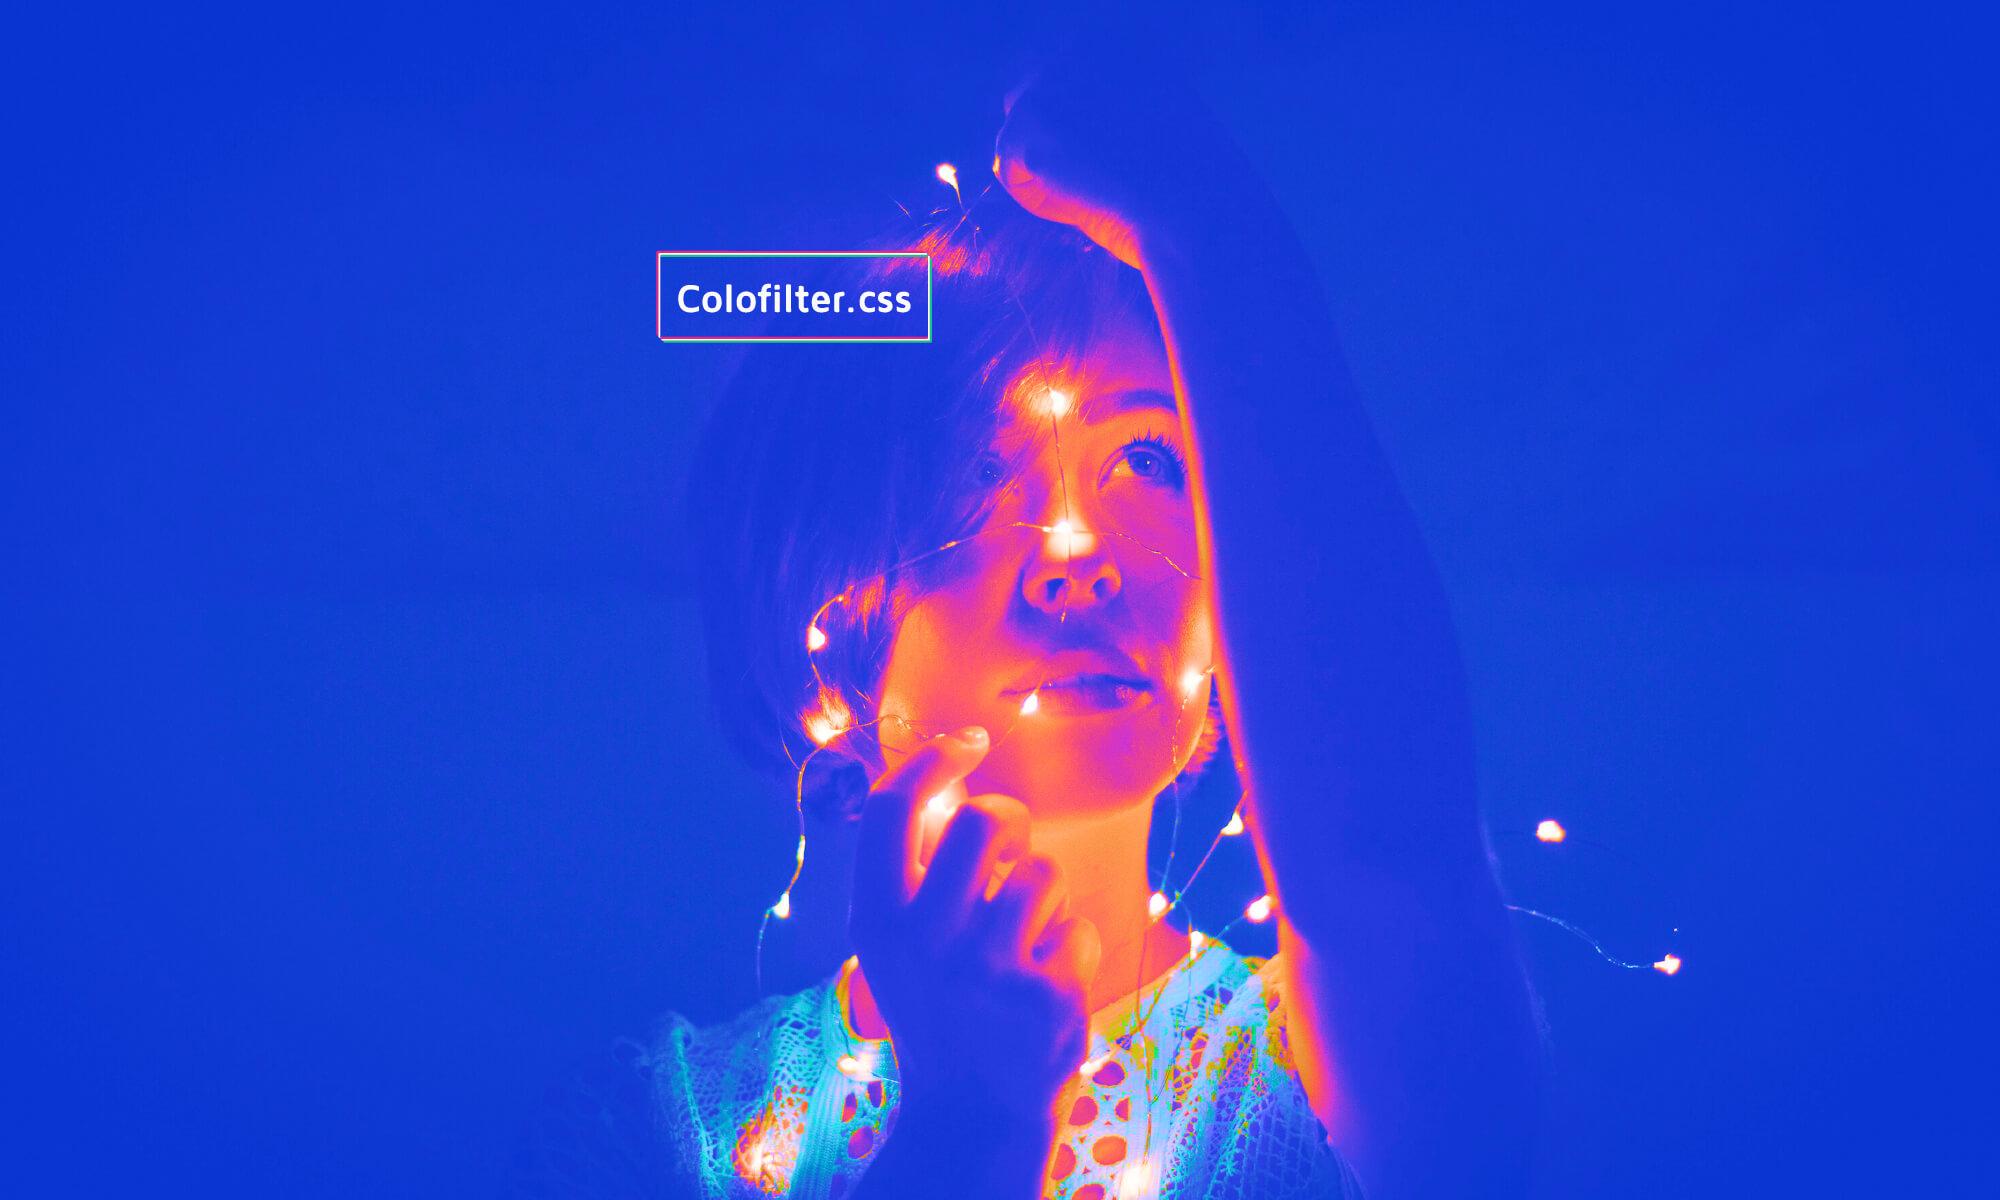 Colofilter.css